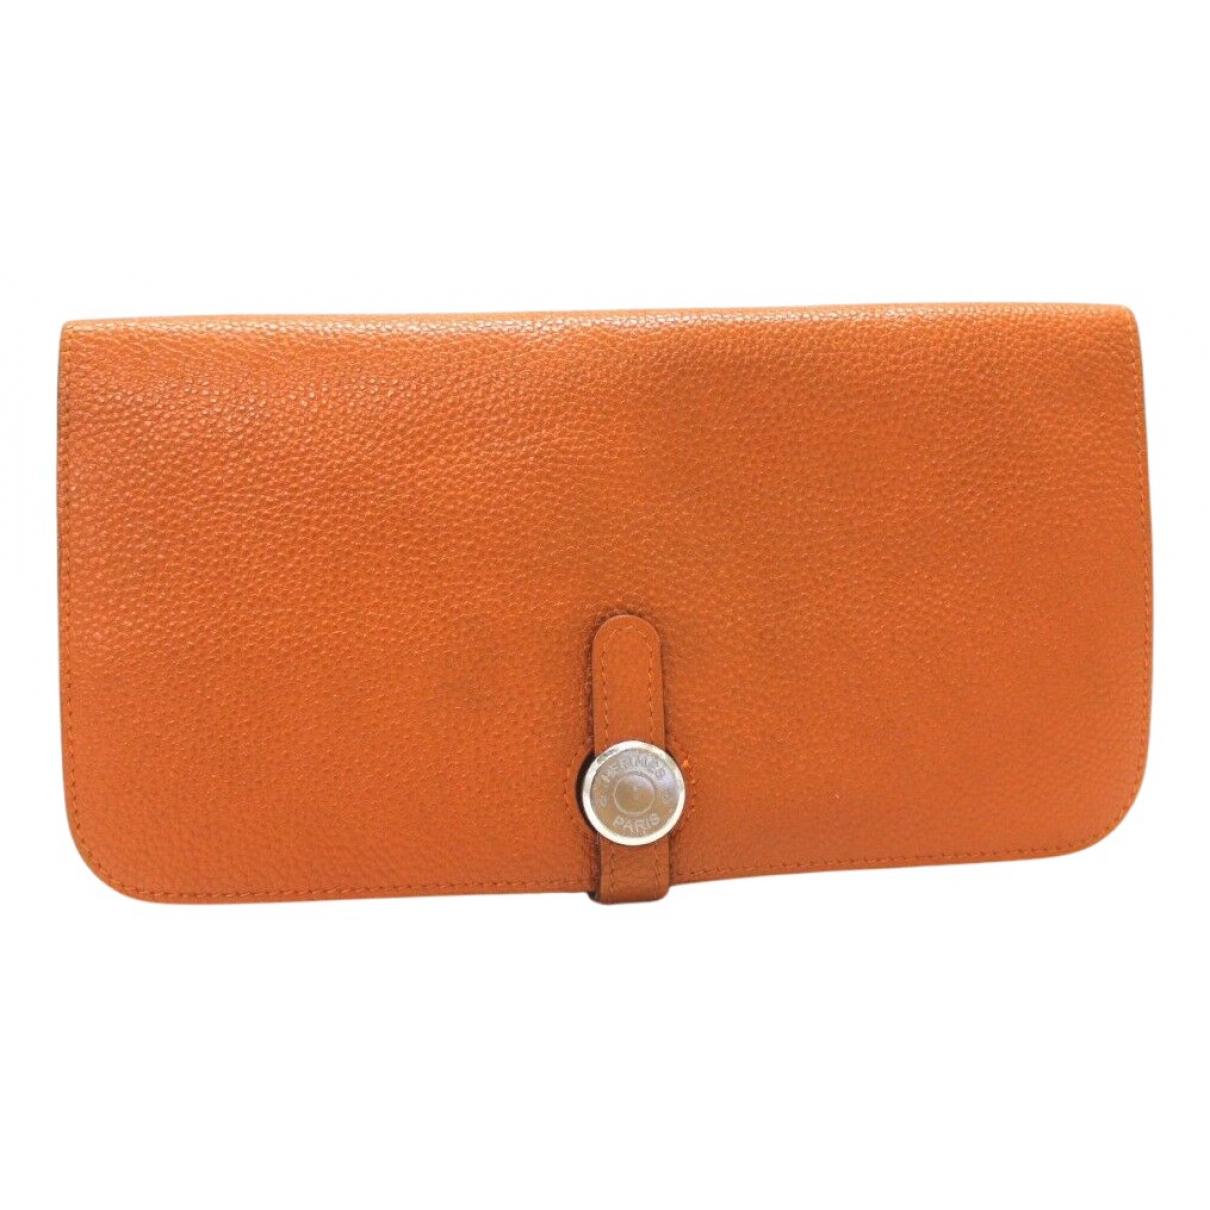 Hermès Dogon Orange Leather wallet for Women N